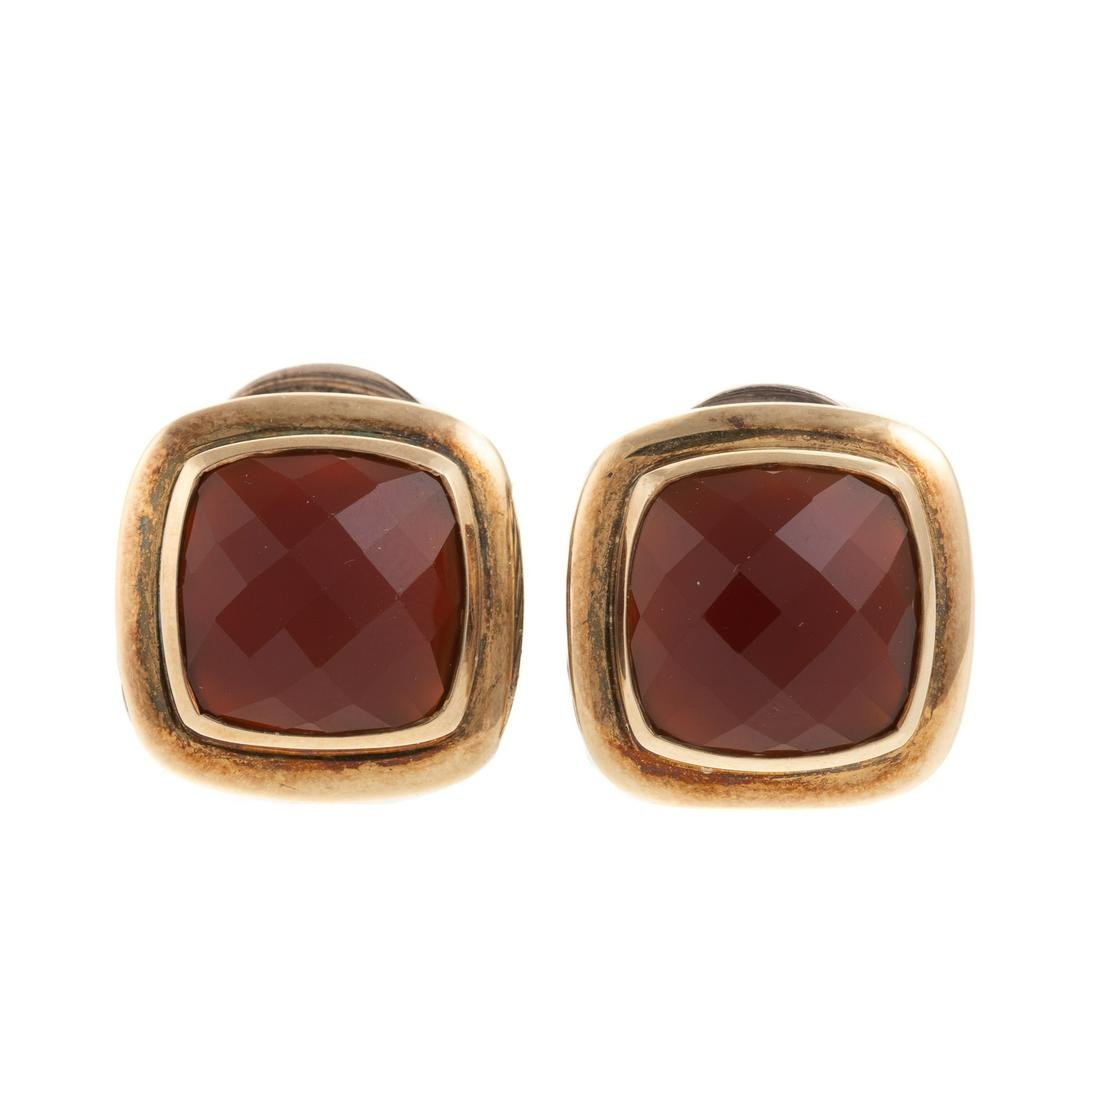 A Pair of David Yurman Two-Tone Carnelian Earrings